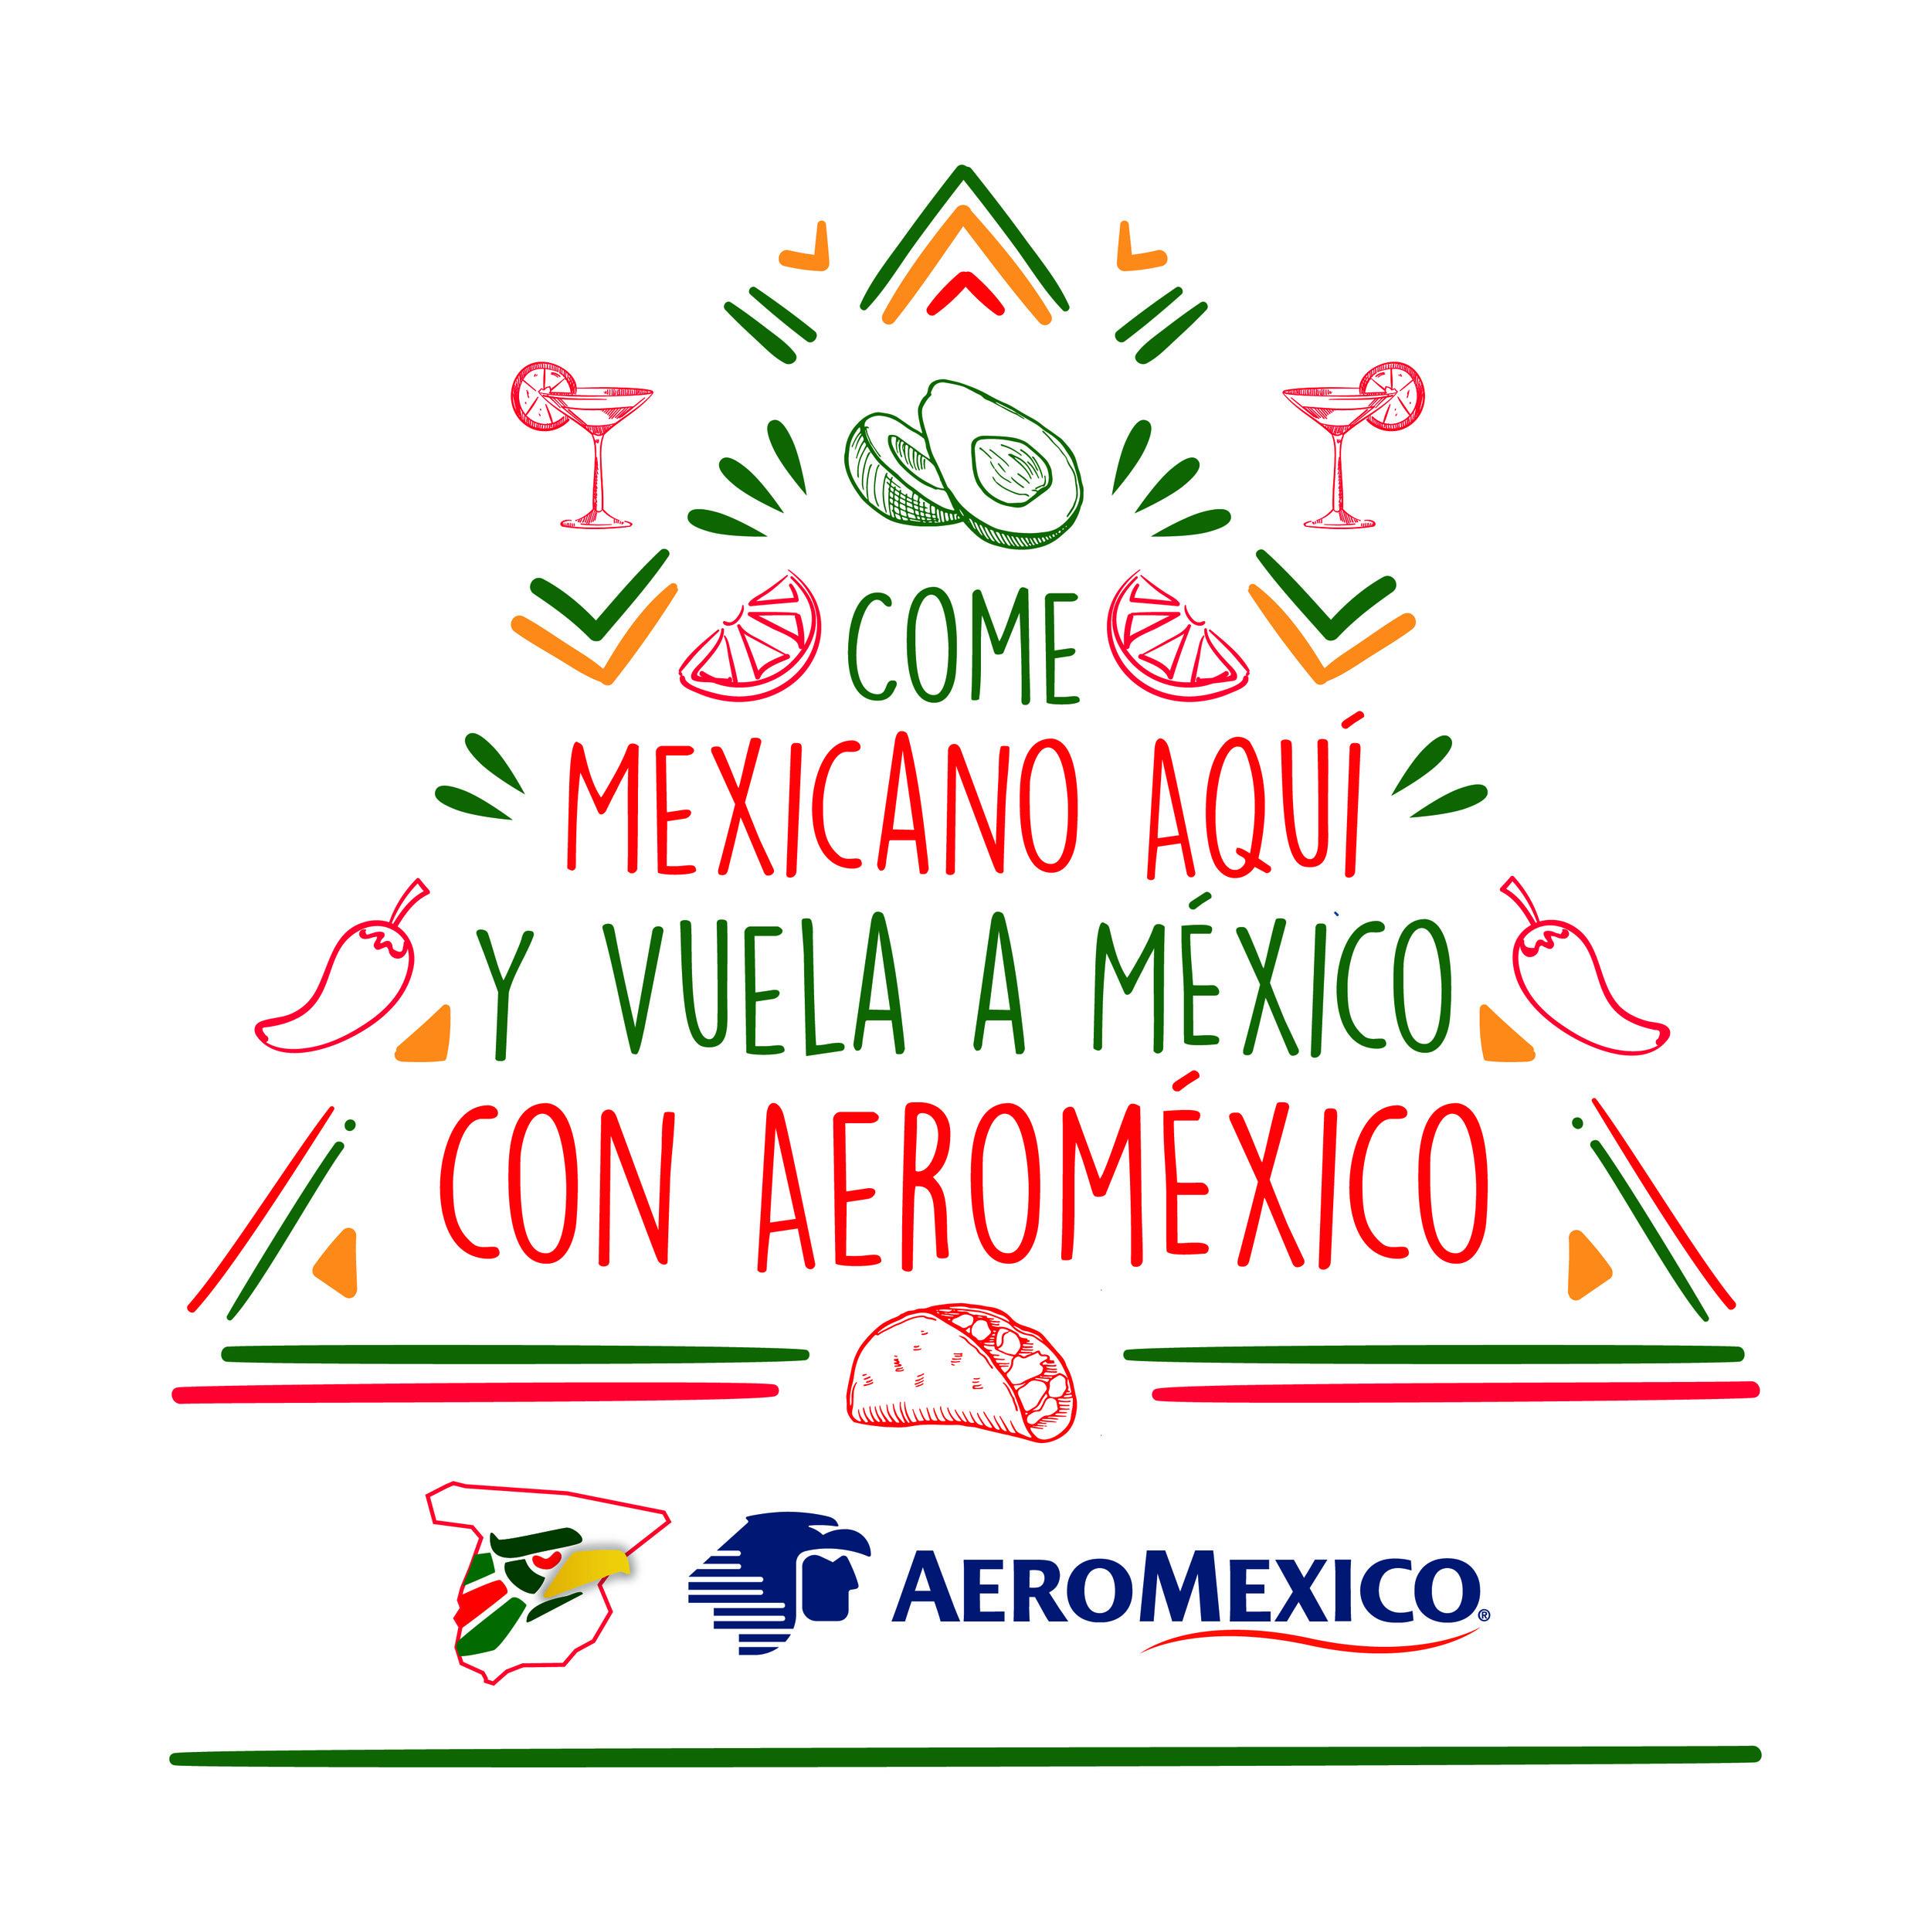 Yincana Mexicanos Aqui-5 julio.jpg